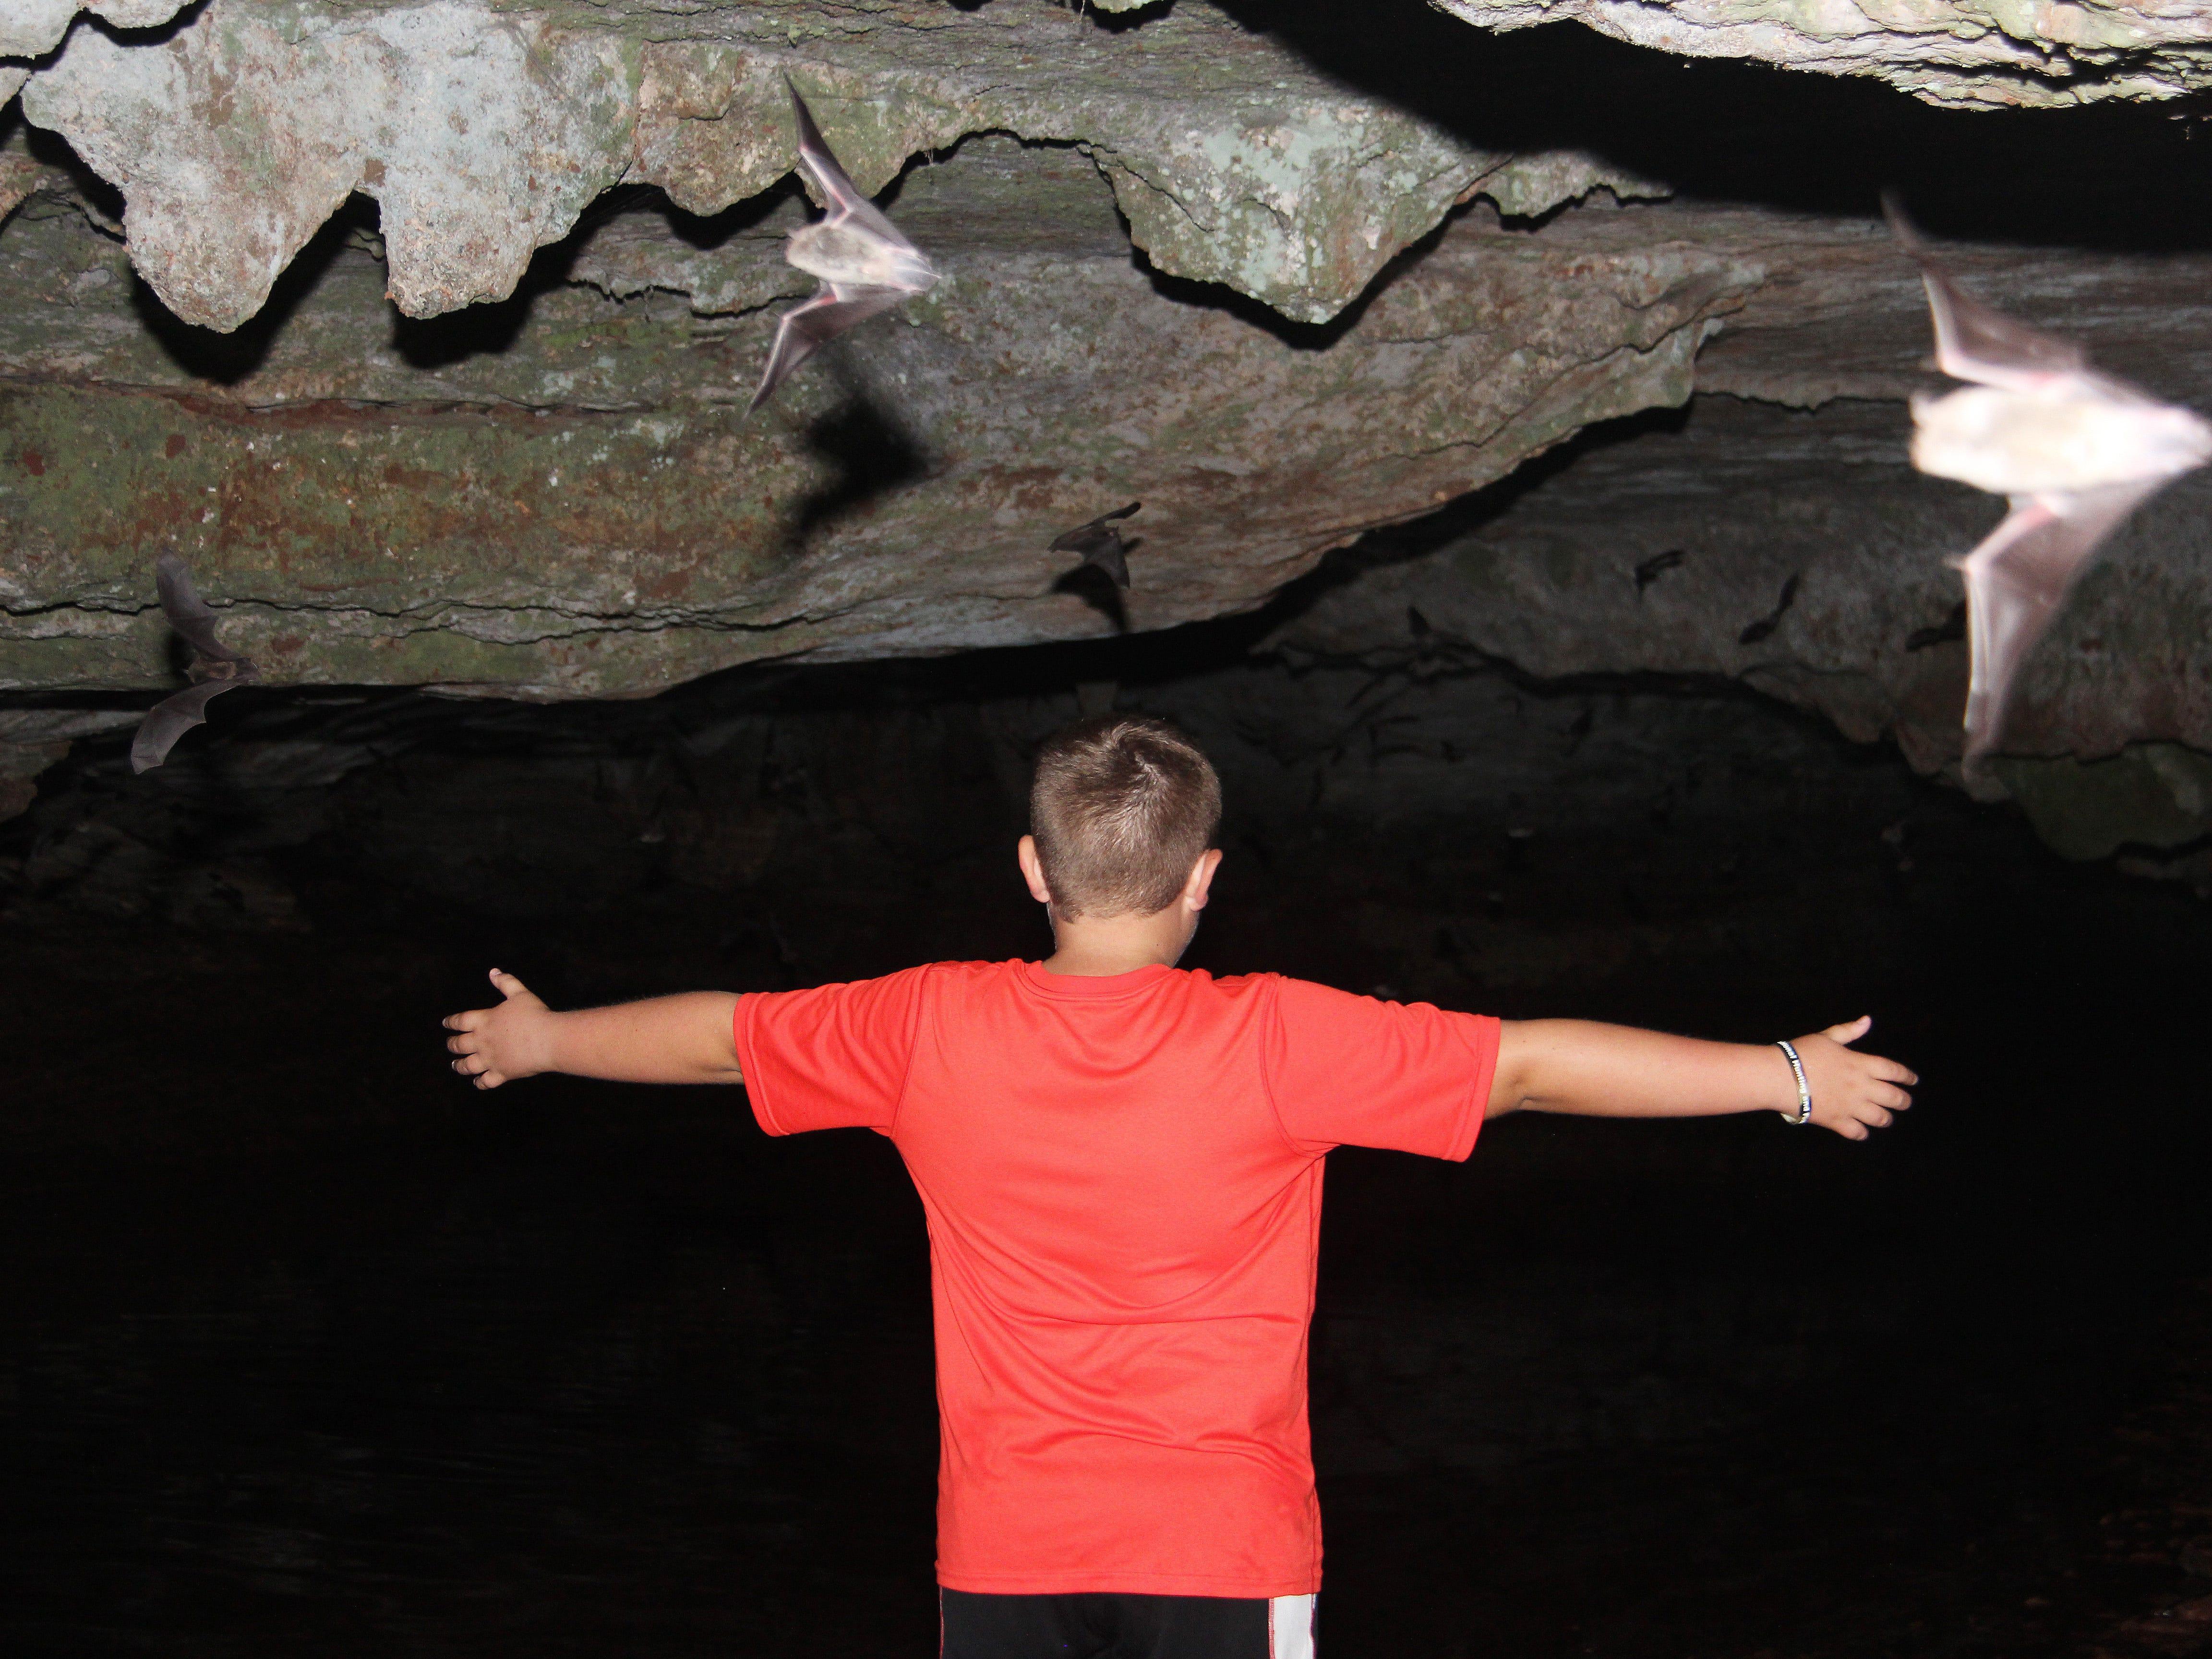 Gray bats swarm around Evan Breuer, 11, at Sequiota Cave.